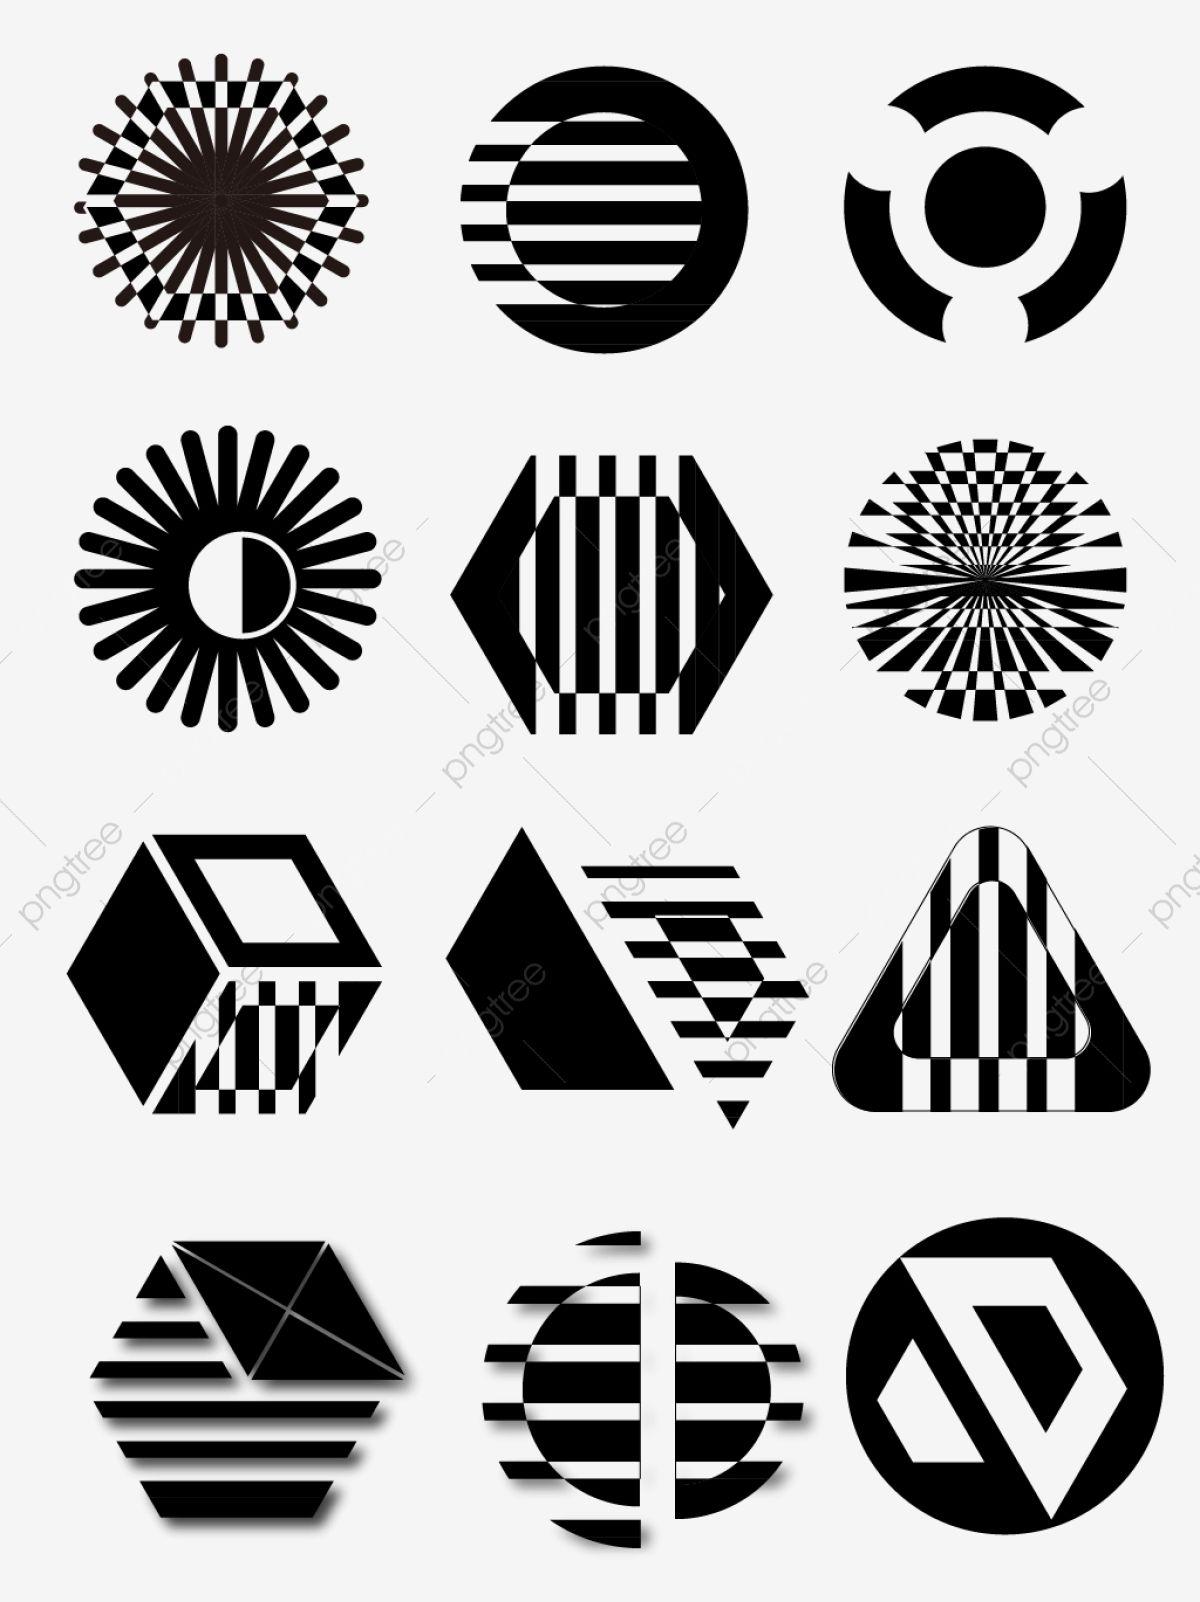 Hexagon - Hexagon Shape Objects | Transparent PNG Download